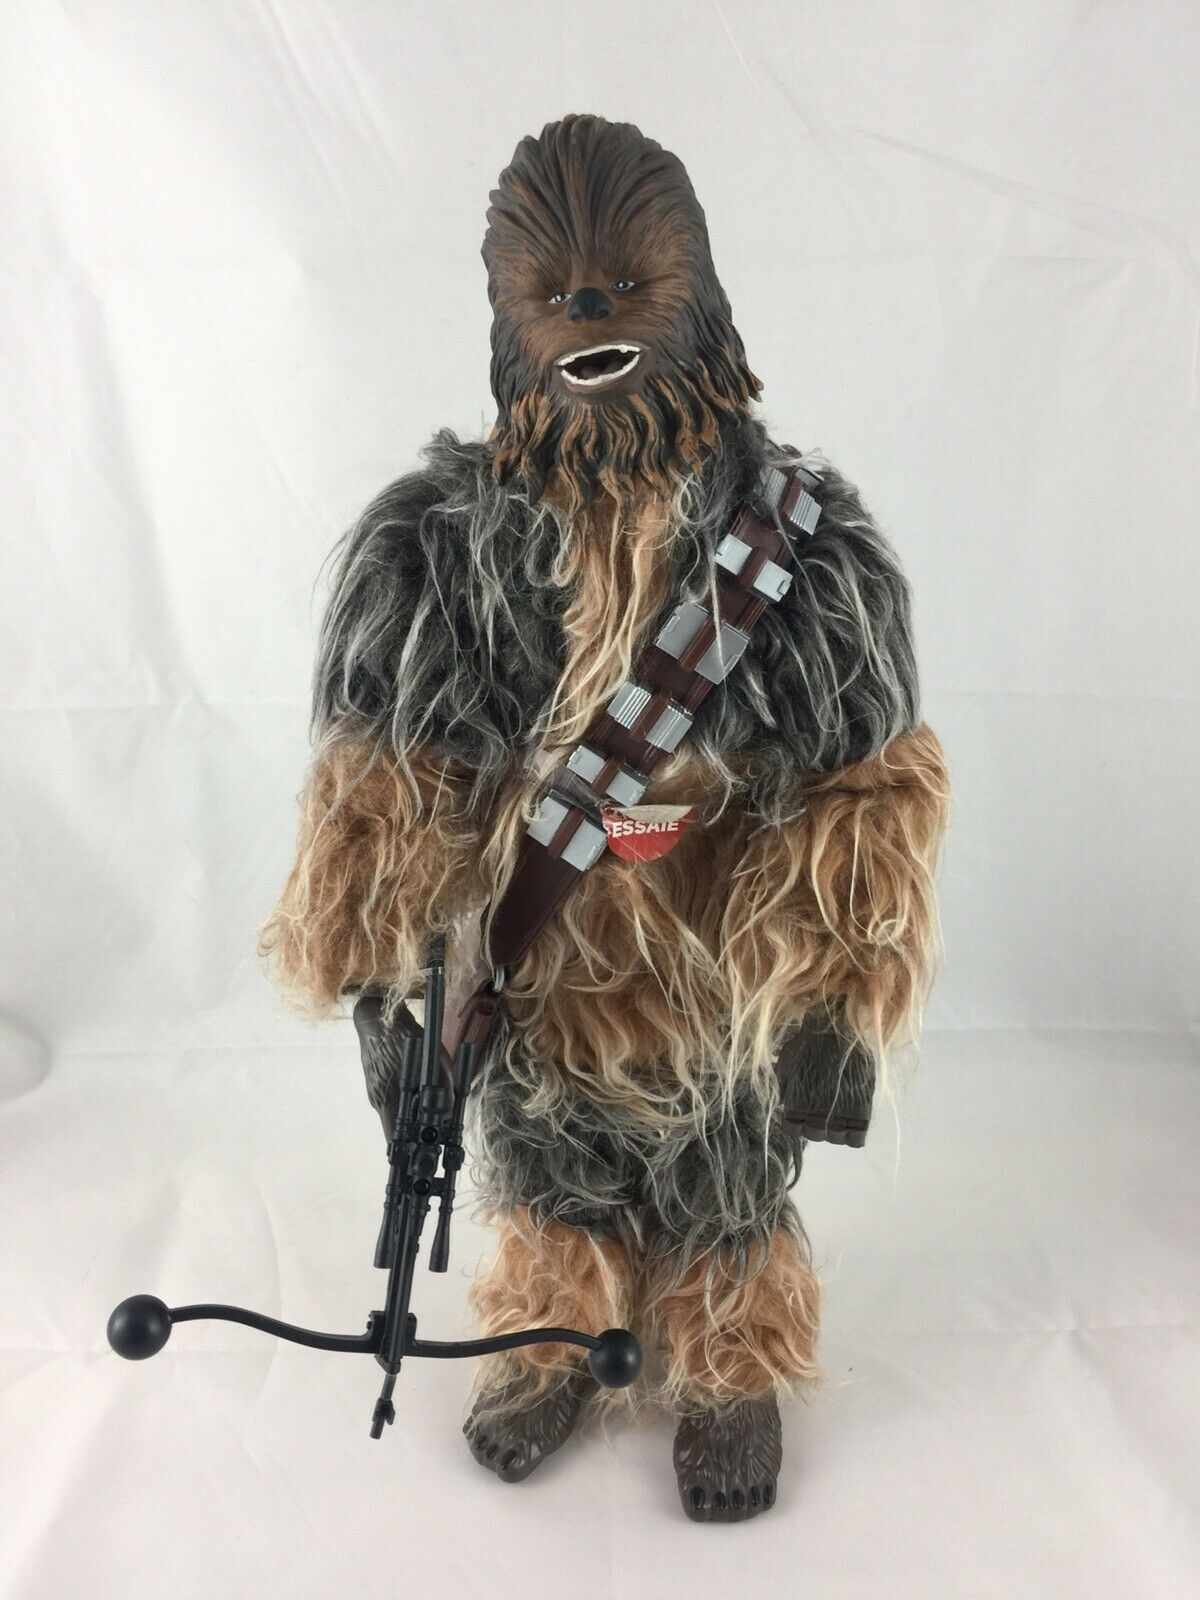 Star Wars The Force Awakens Chewbacca Animatronic Interactive Talking 17  Figure